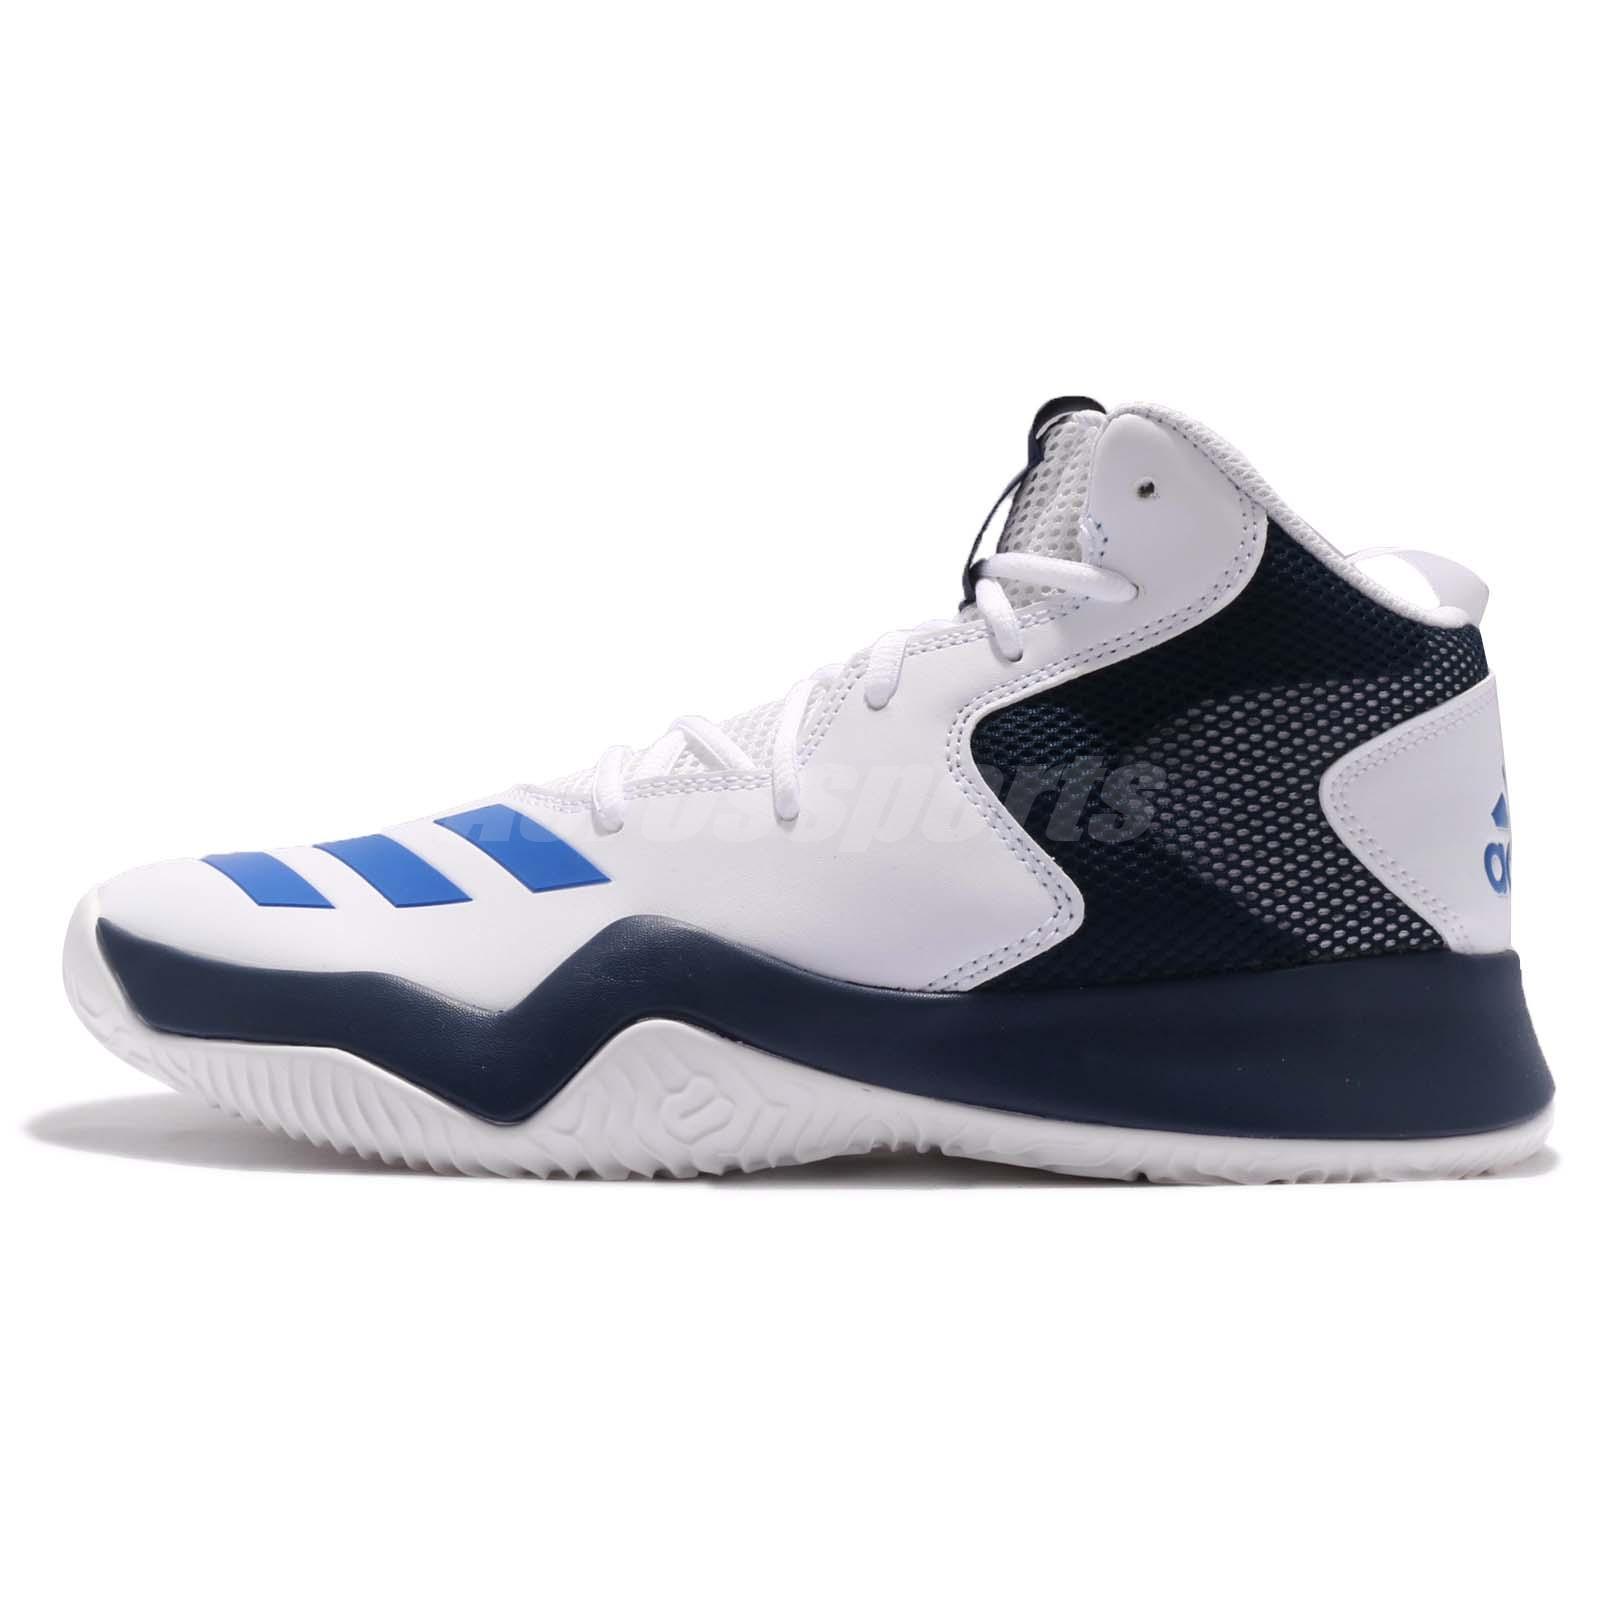 adidas Crazy Team II 2 Hi White Blue Navy Men Basketball Shoes Trainers  CQ0837 89319e1f330c